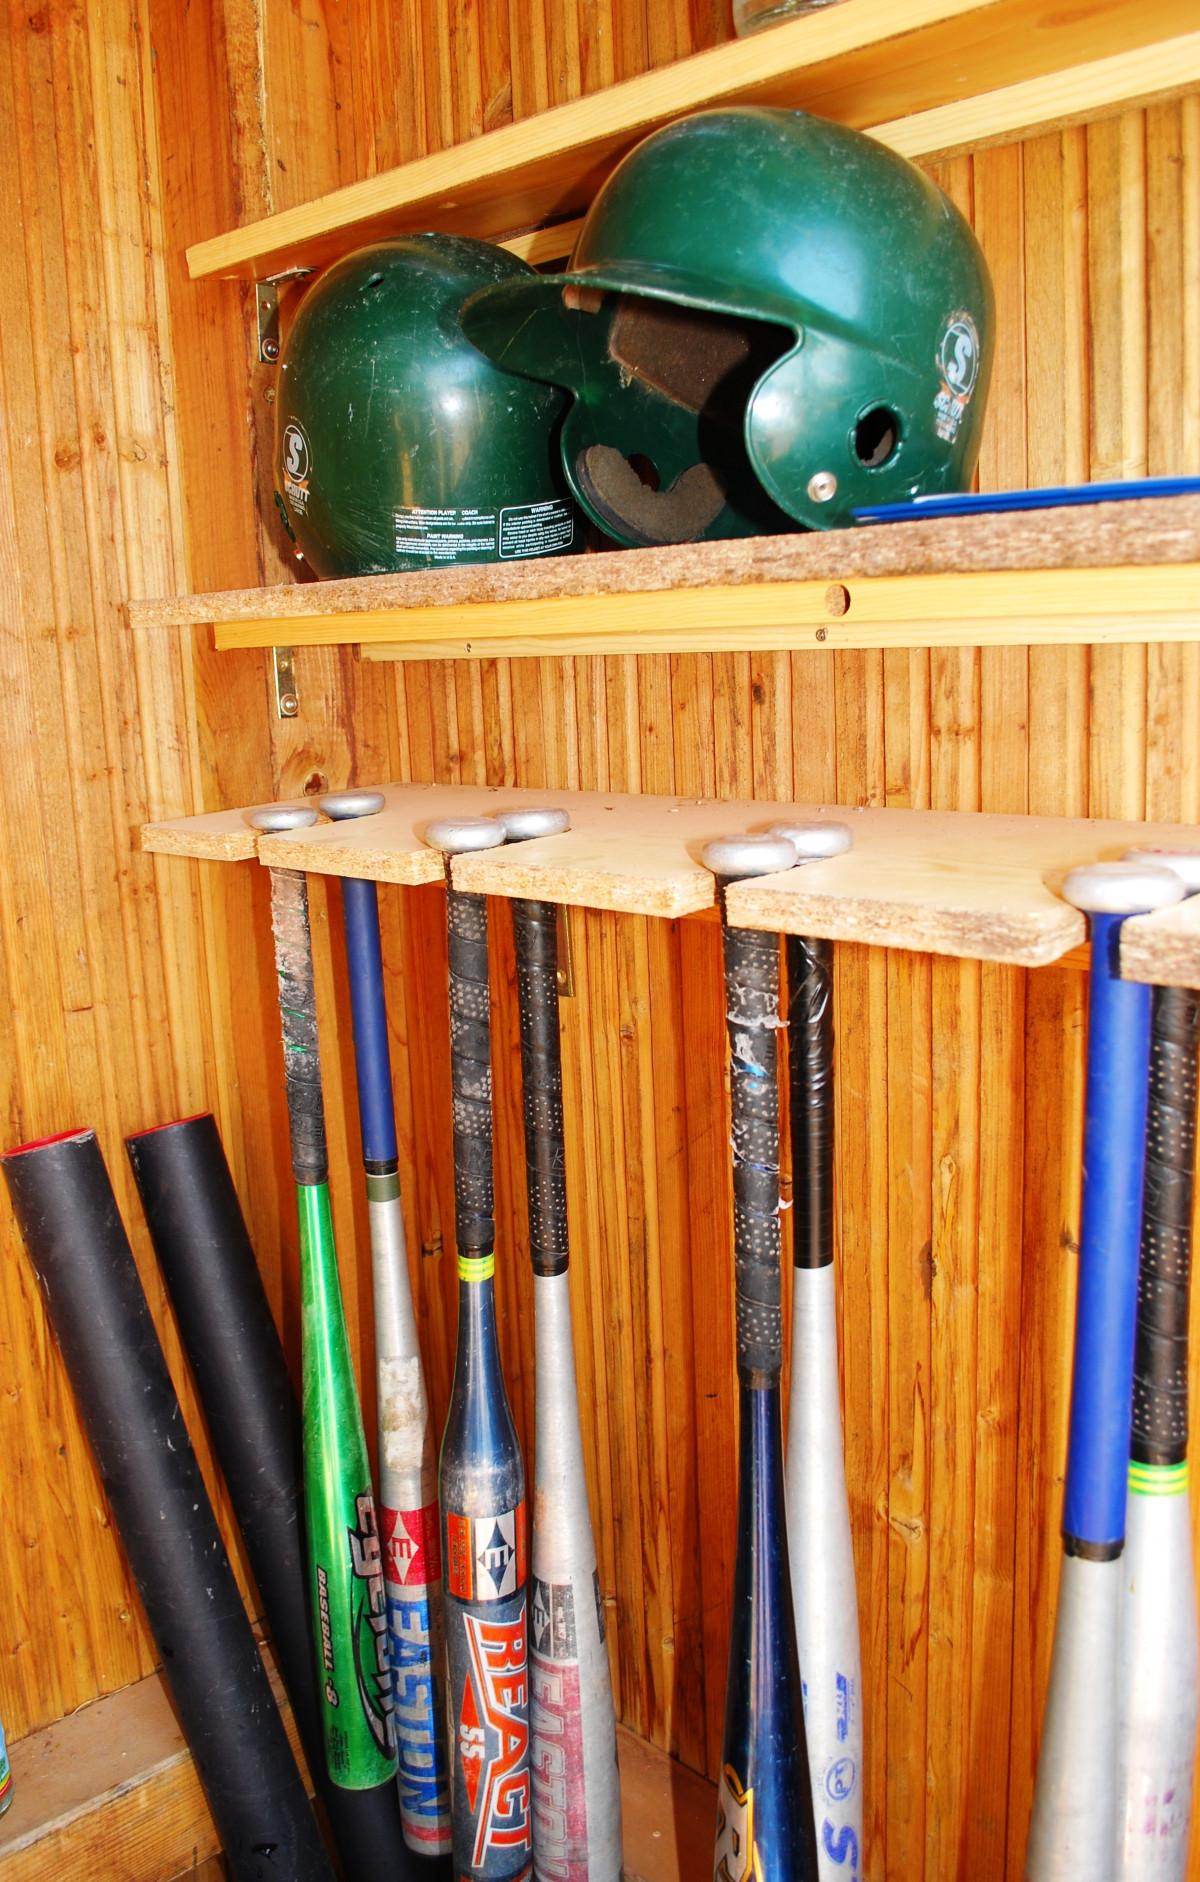 Wood Baseball Sport Game Recreation Equipment Shelf Furniture Art Sports  Helmet Ball Bat Games Baseball Bat